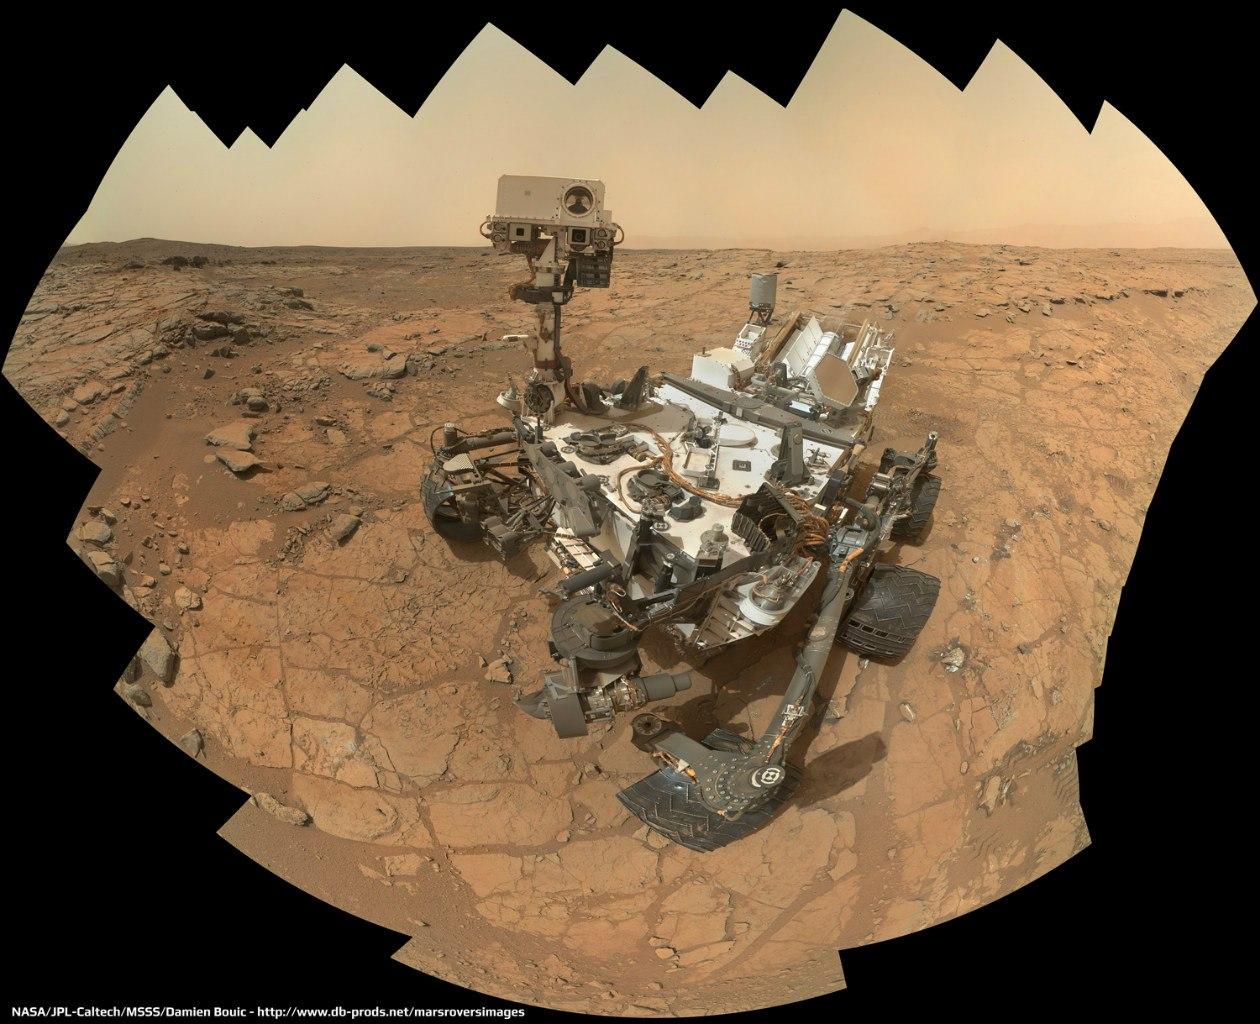 Хипстер с дрелью на Марсе